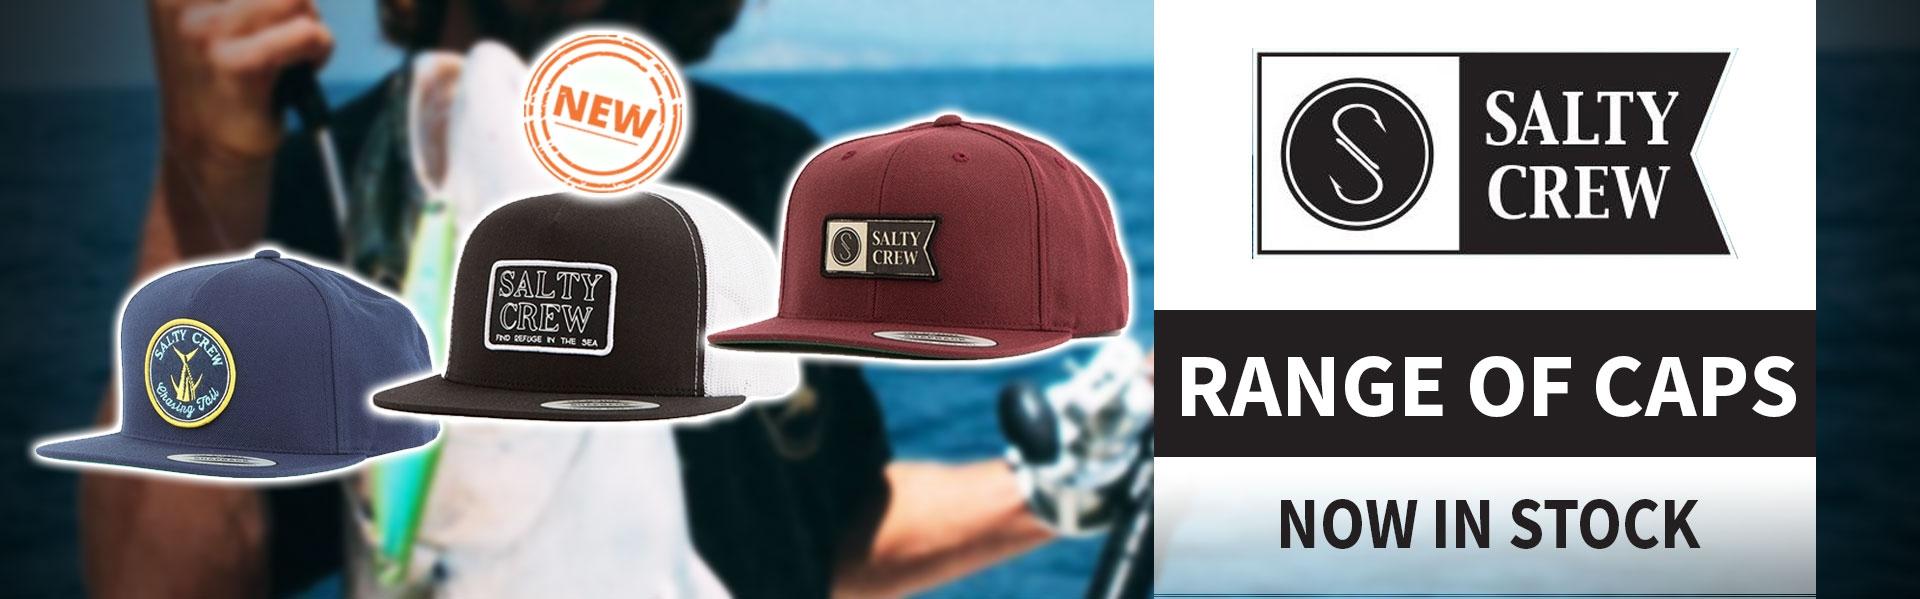 Salty Crew Hats